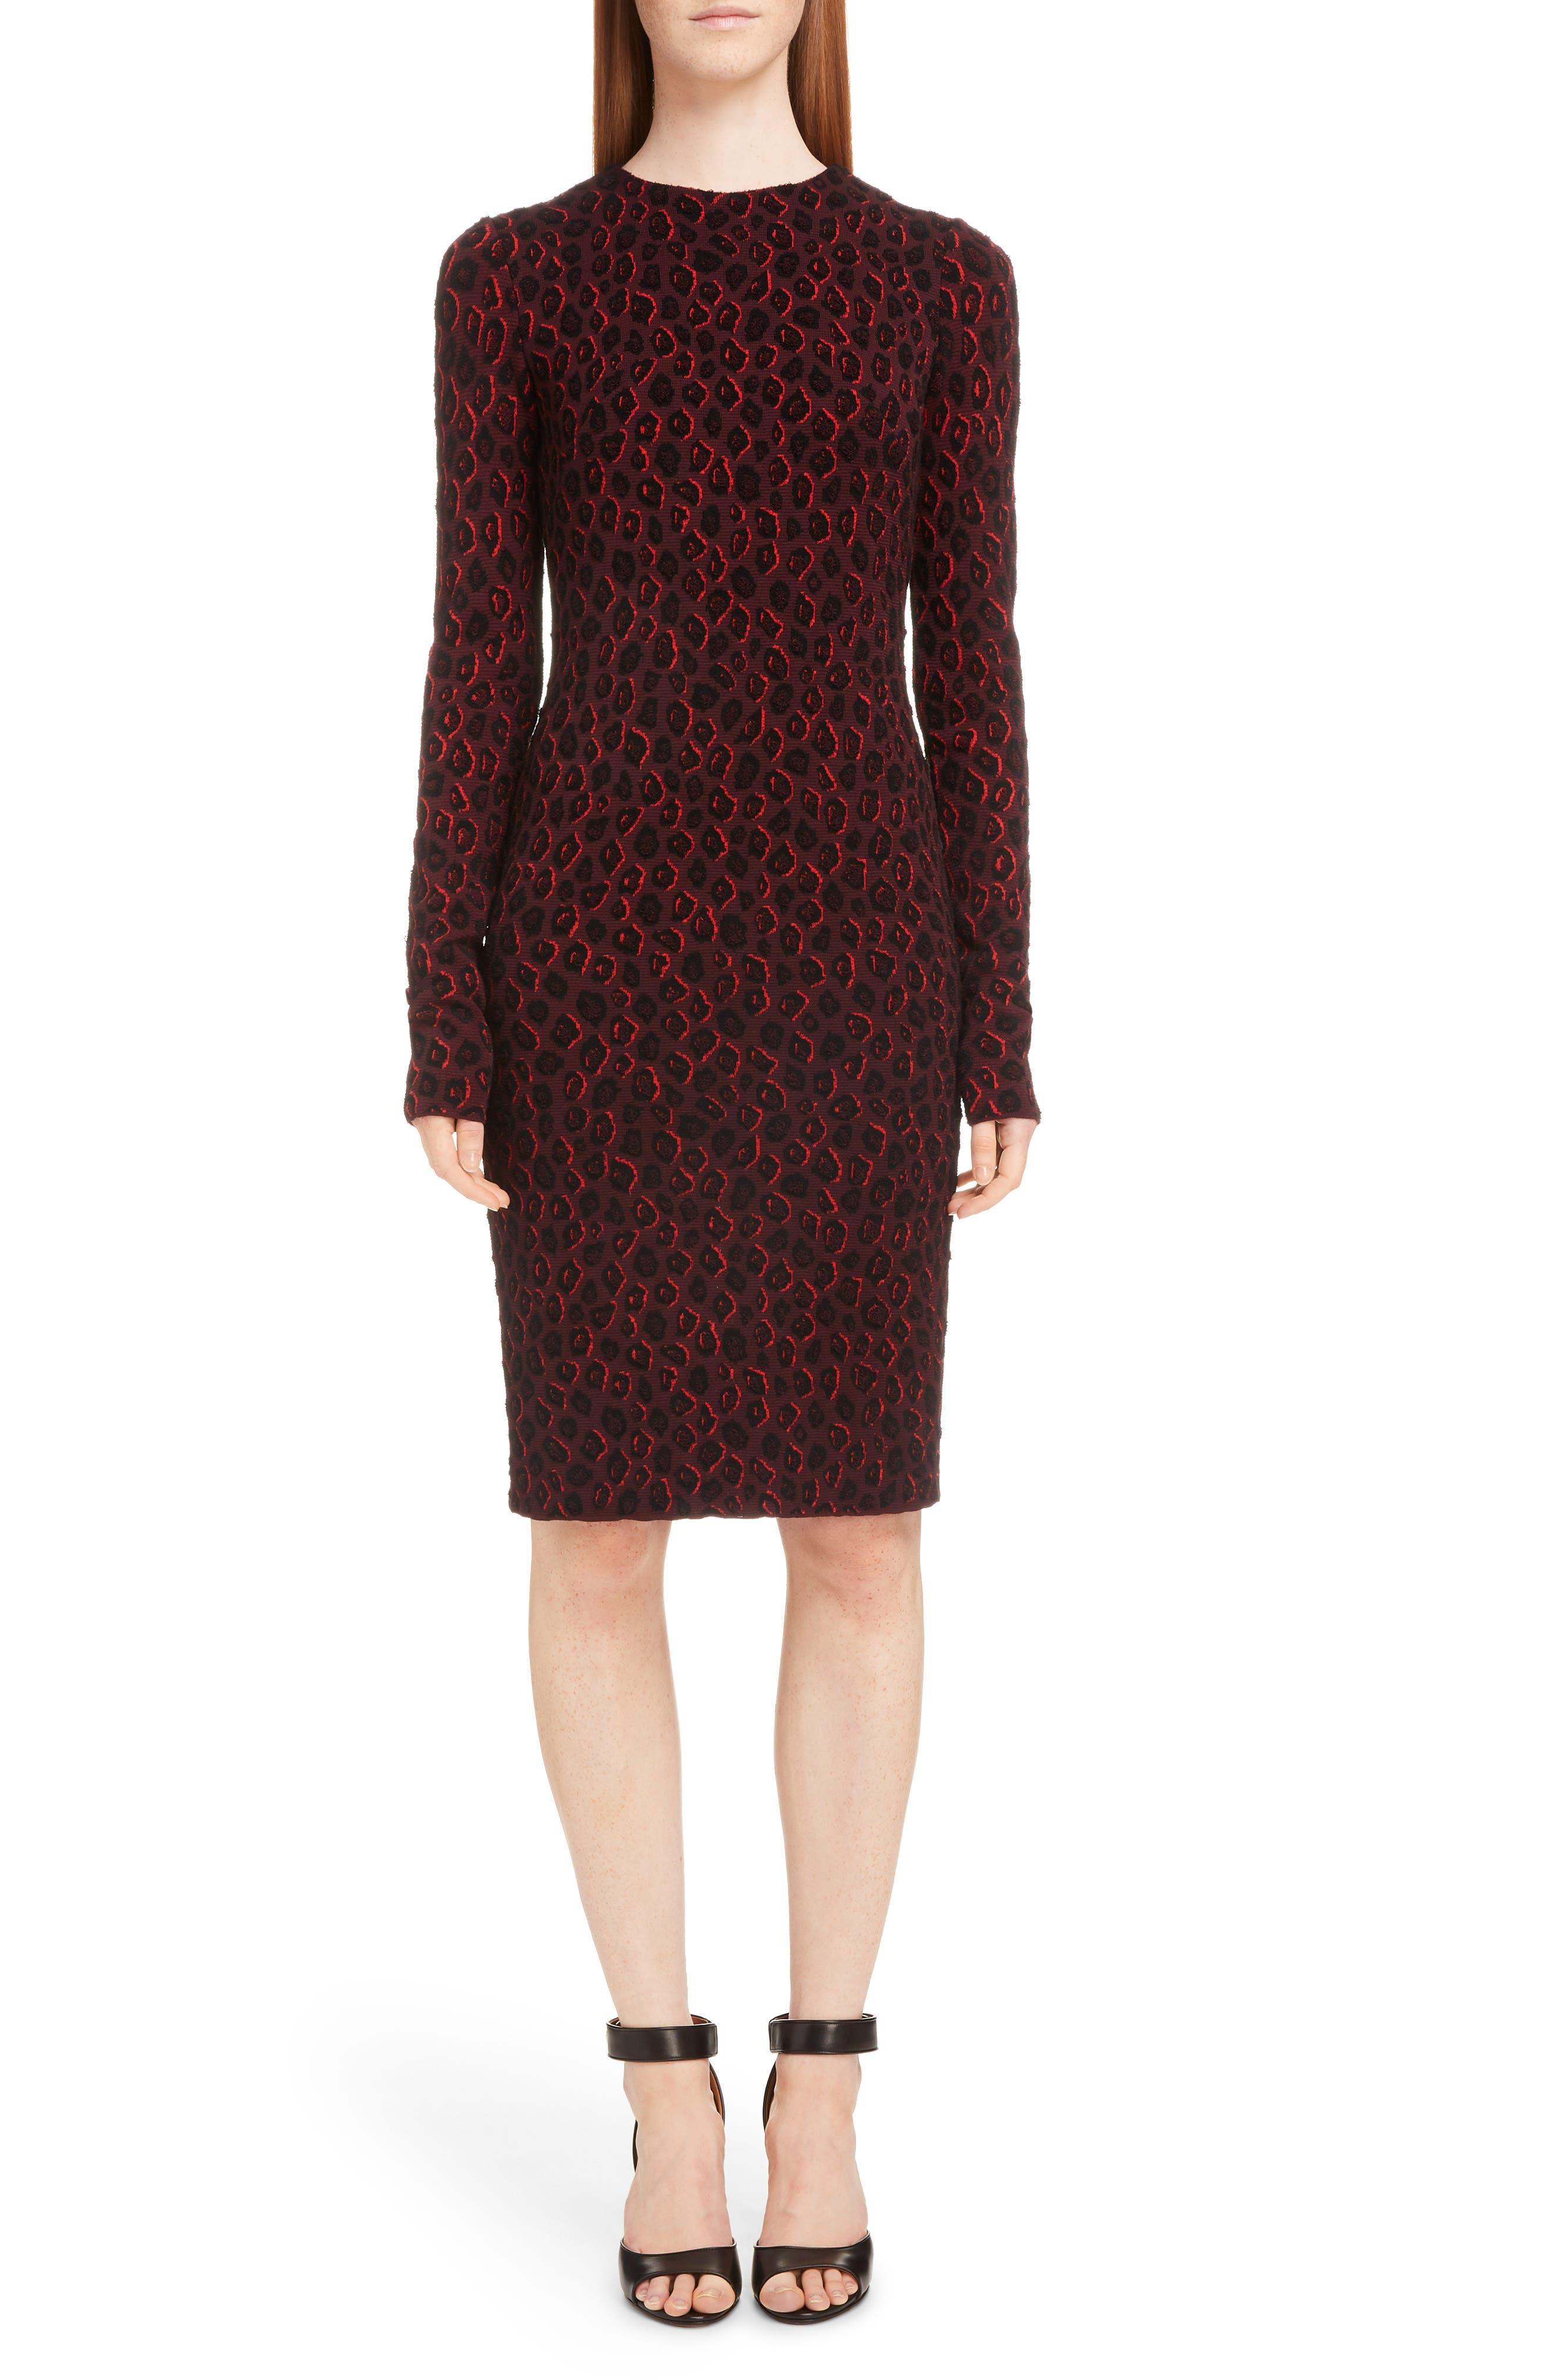 Givenchy Leopard Jacquard Dress, Burgundy